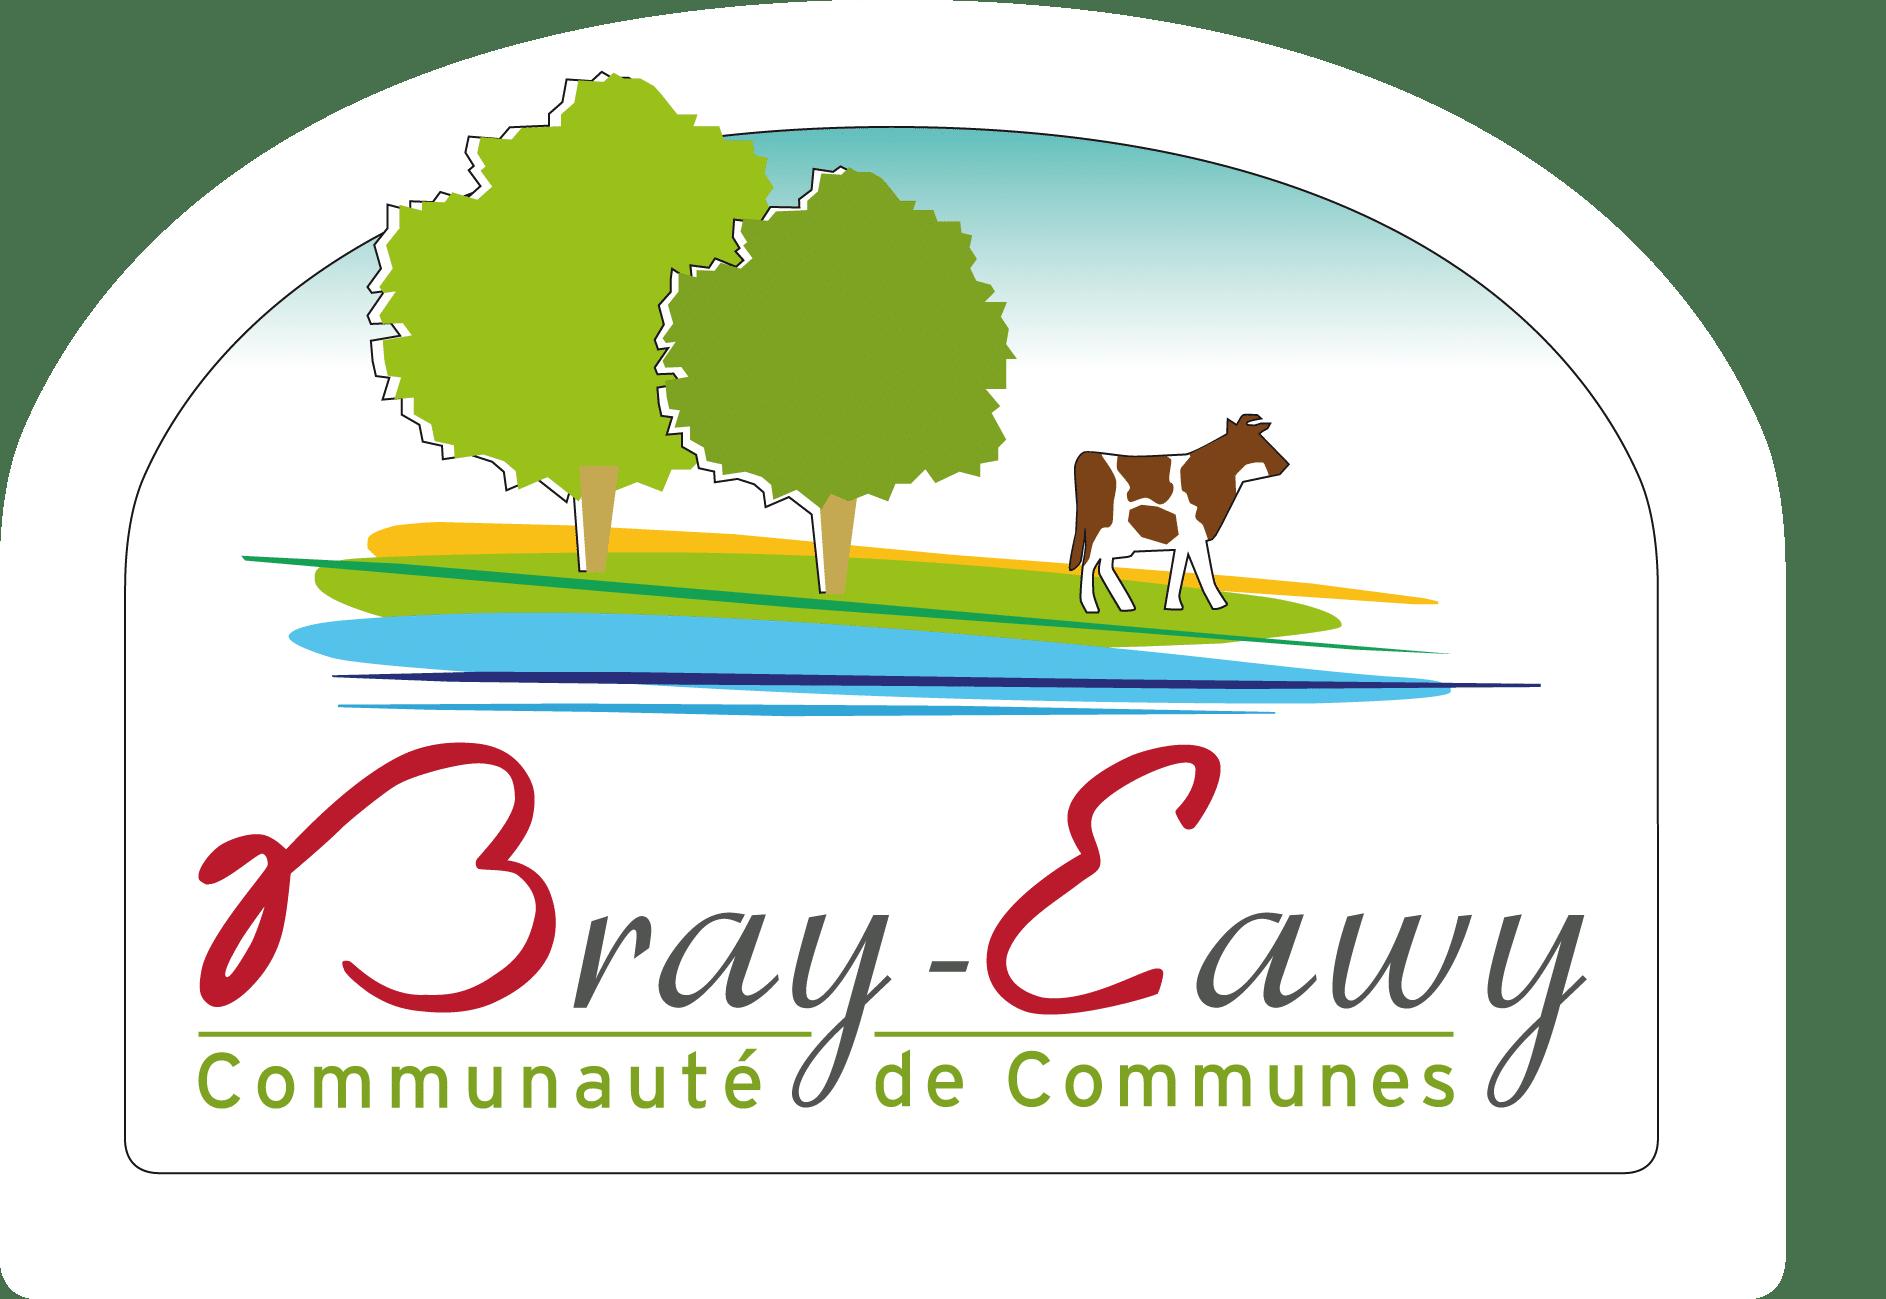 Bray Eawy Tourisme